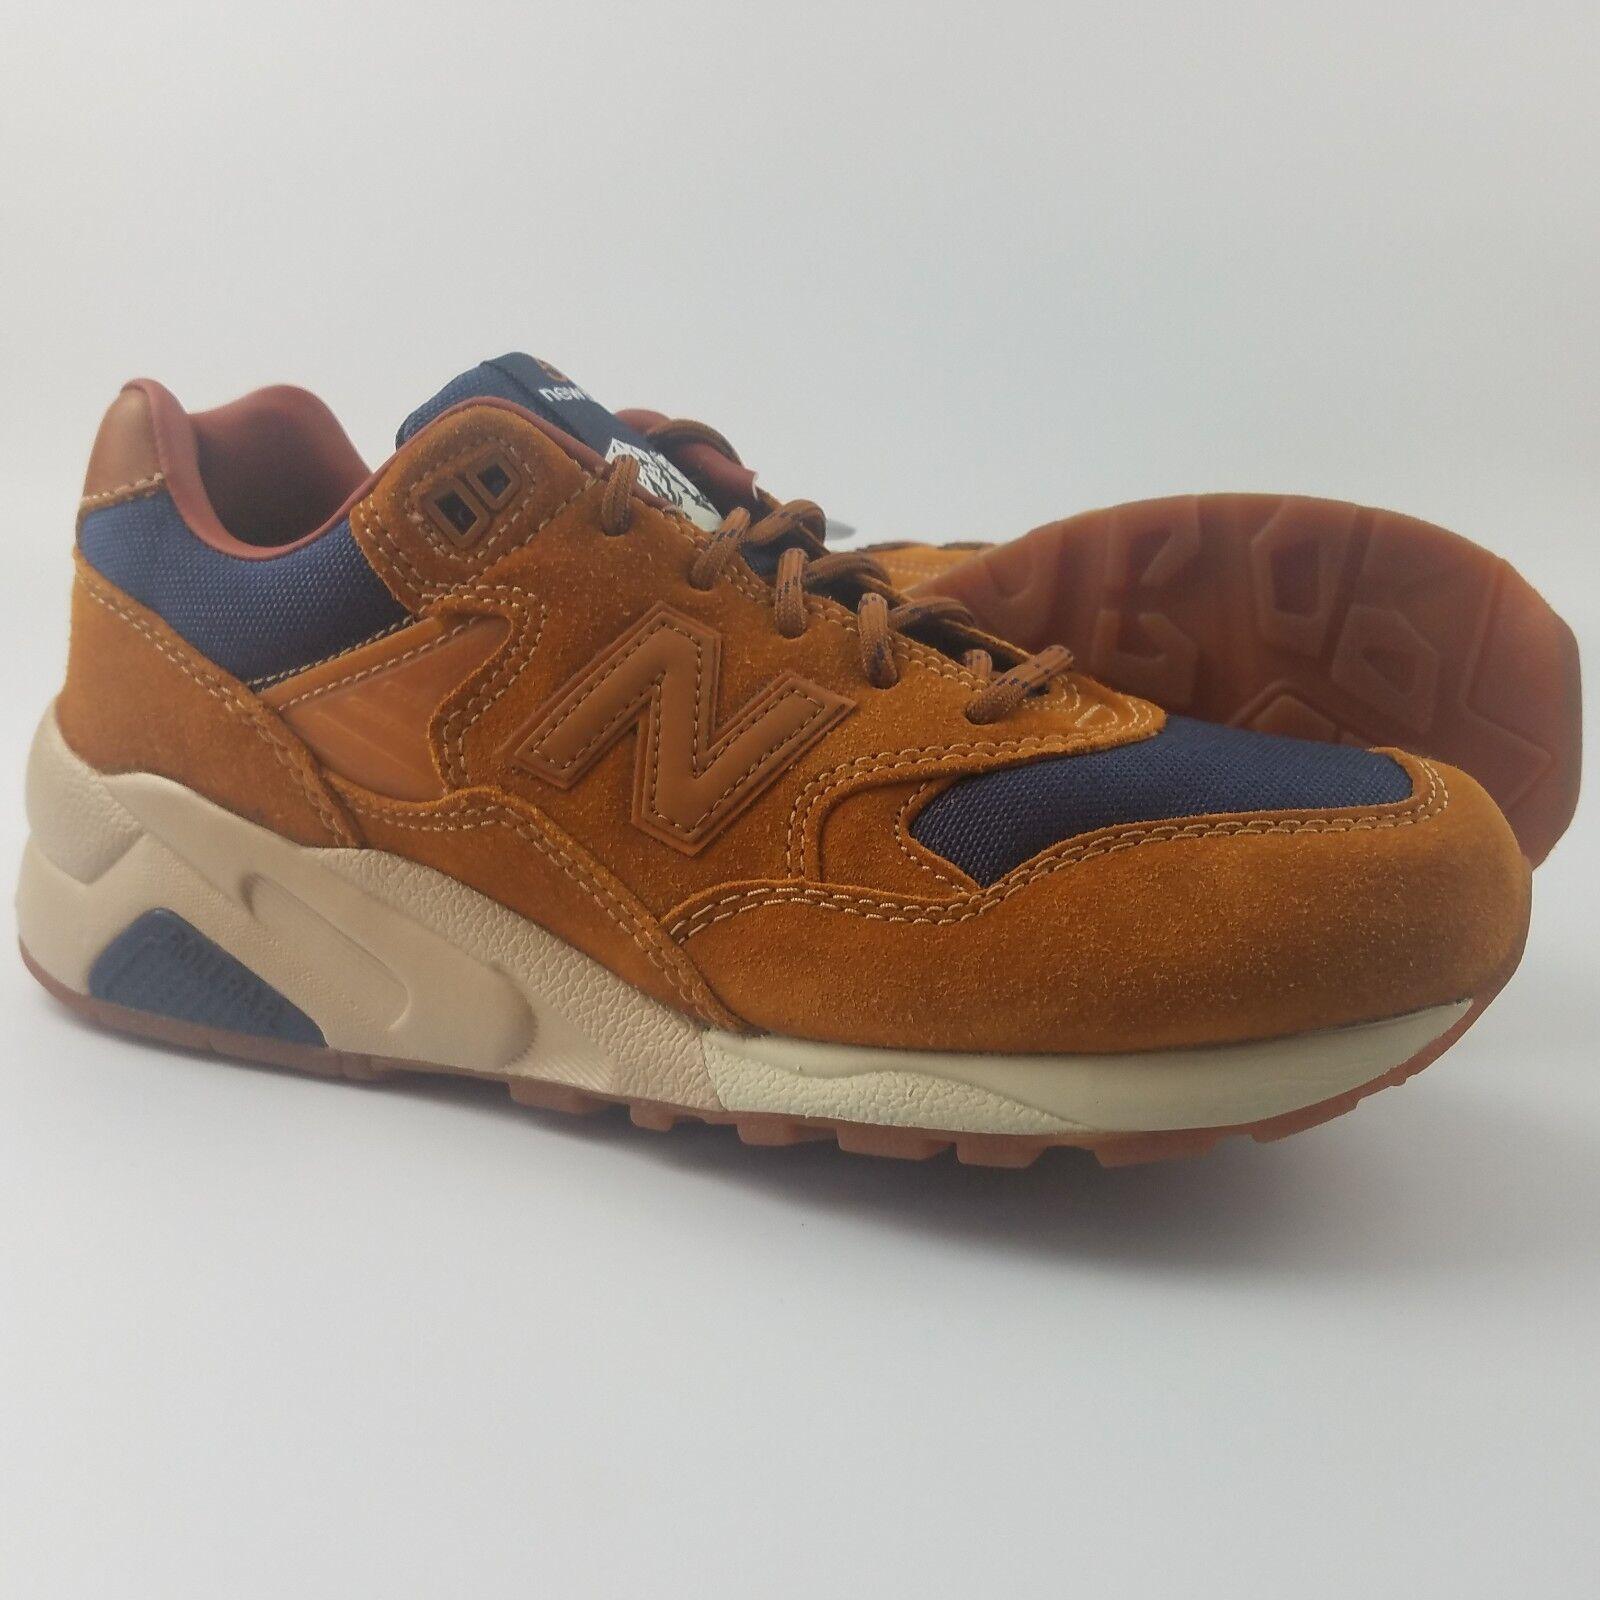 New Balance 580 Mens Size 7.5  Running shoes Cordura Brown Navy blueee MT580SB